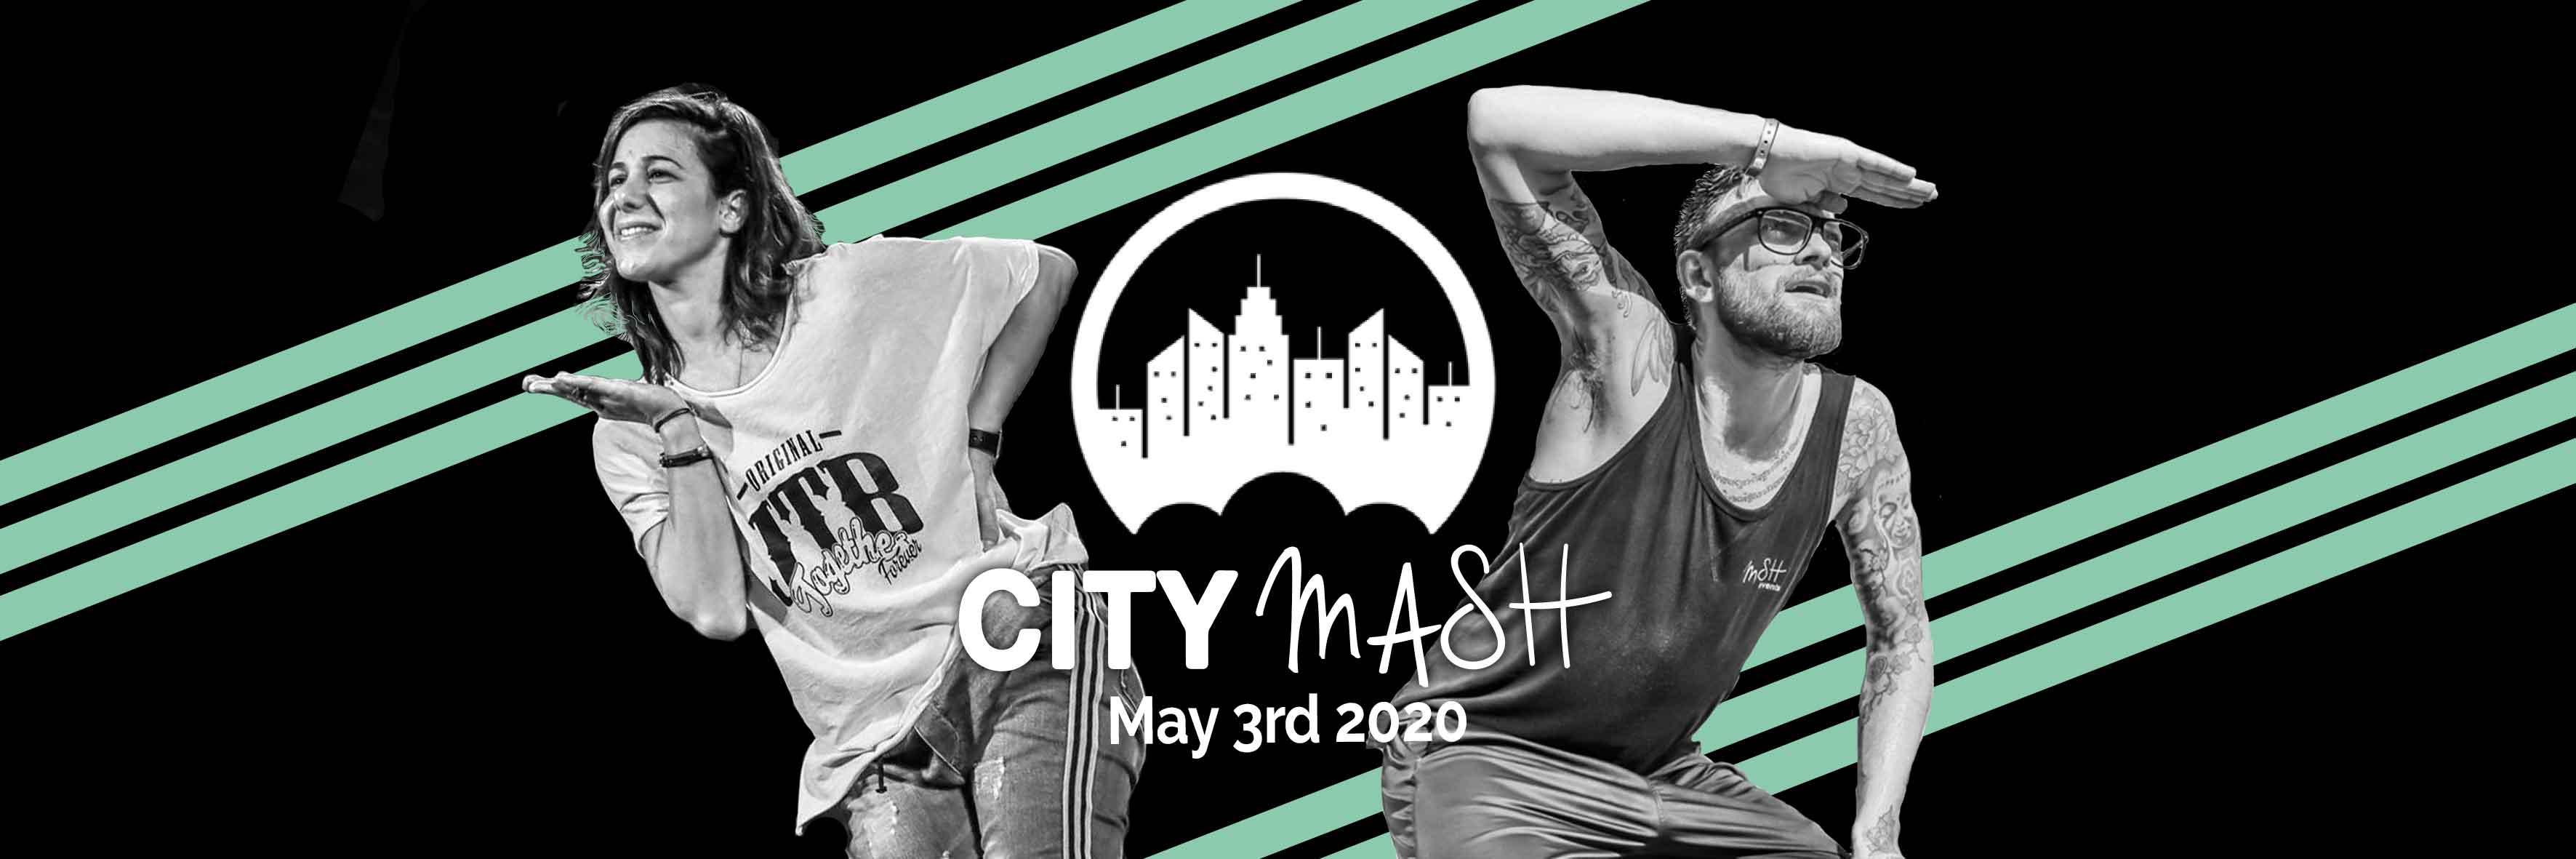 citymash3.5.2020